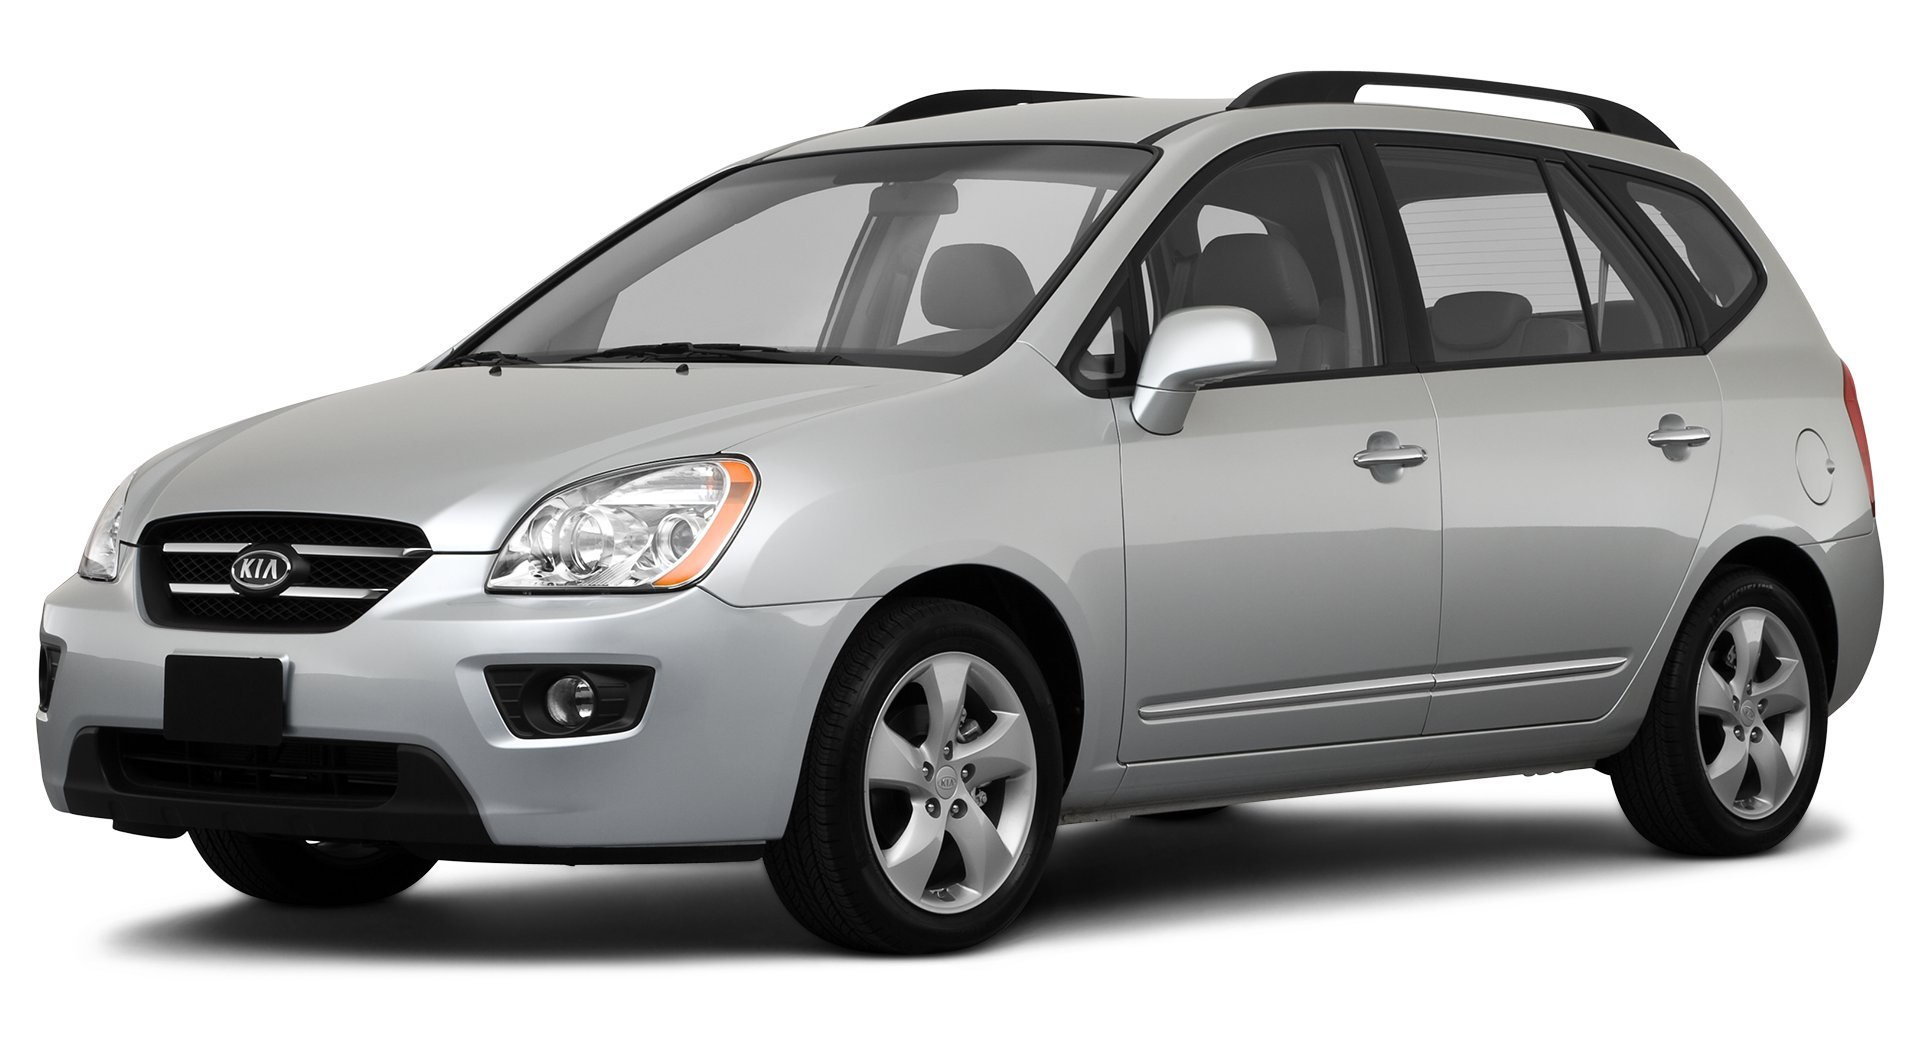 2009 Kia Rondo Reviews Images And Specs Vehicles Kompresor Carens 1 Ex 4 Door Wagon Cylinder